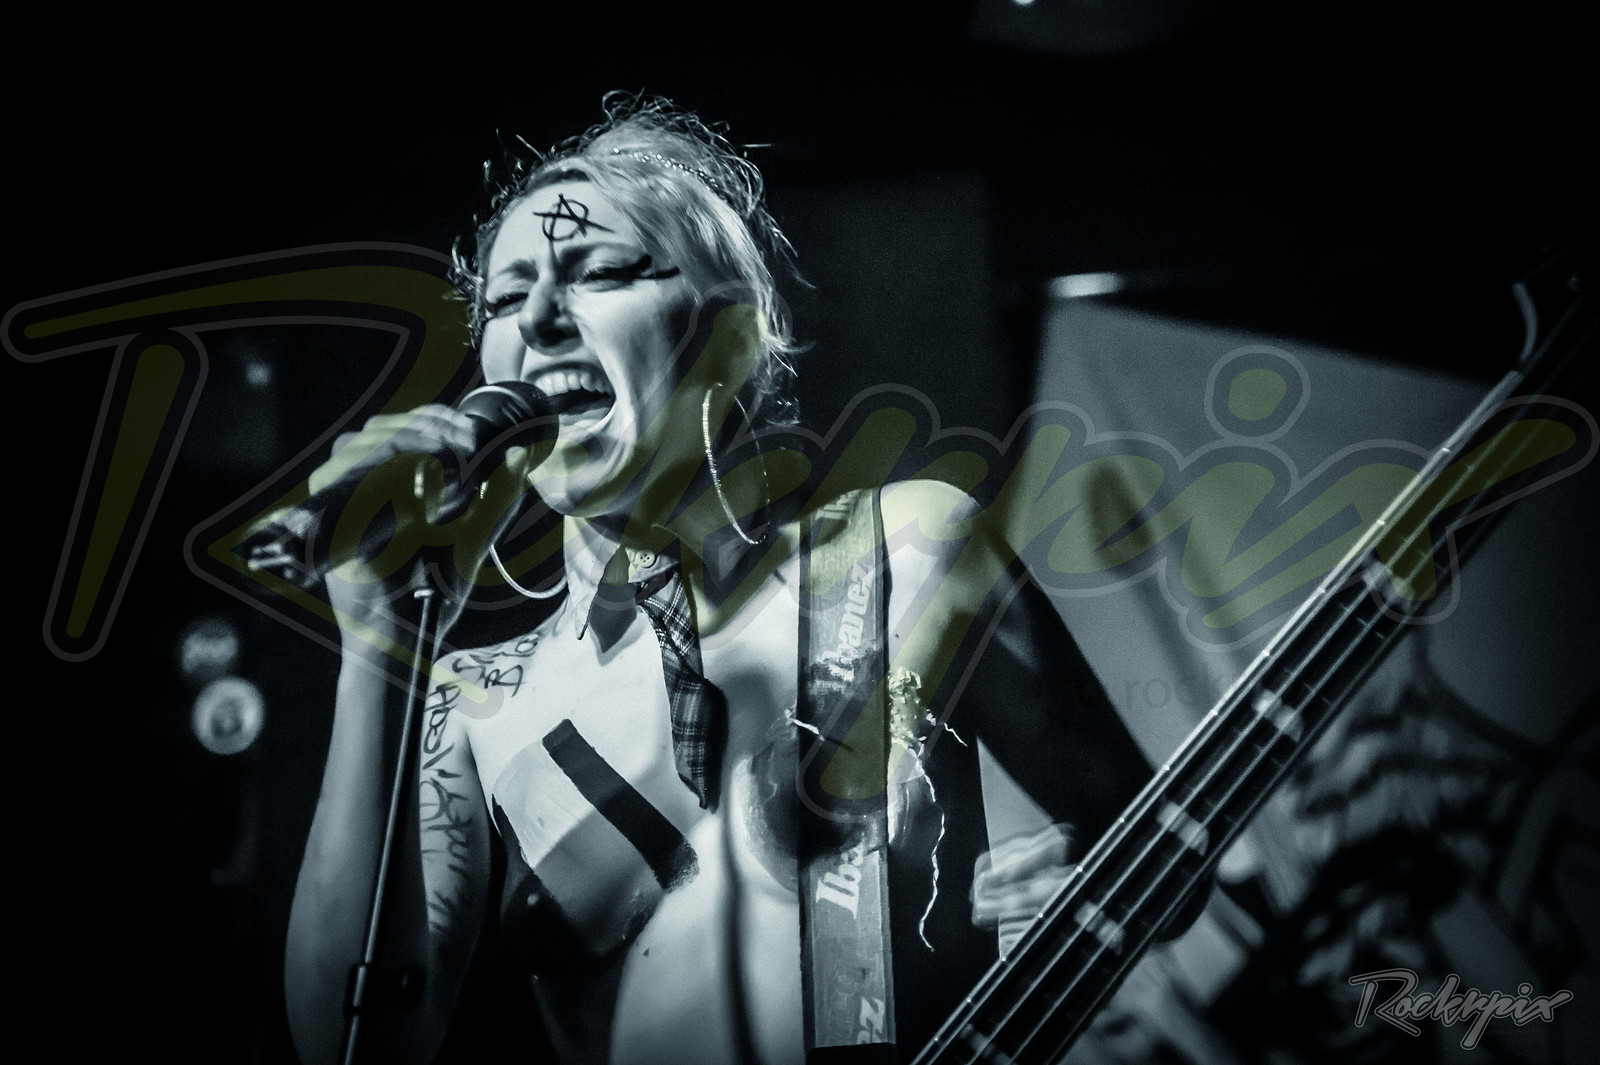 ©Rockrpix  - The Soap Girls